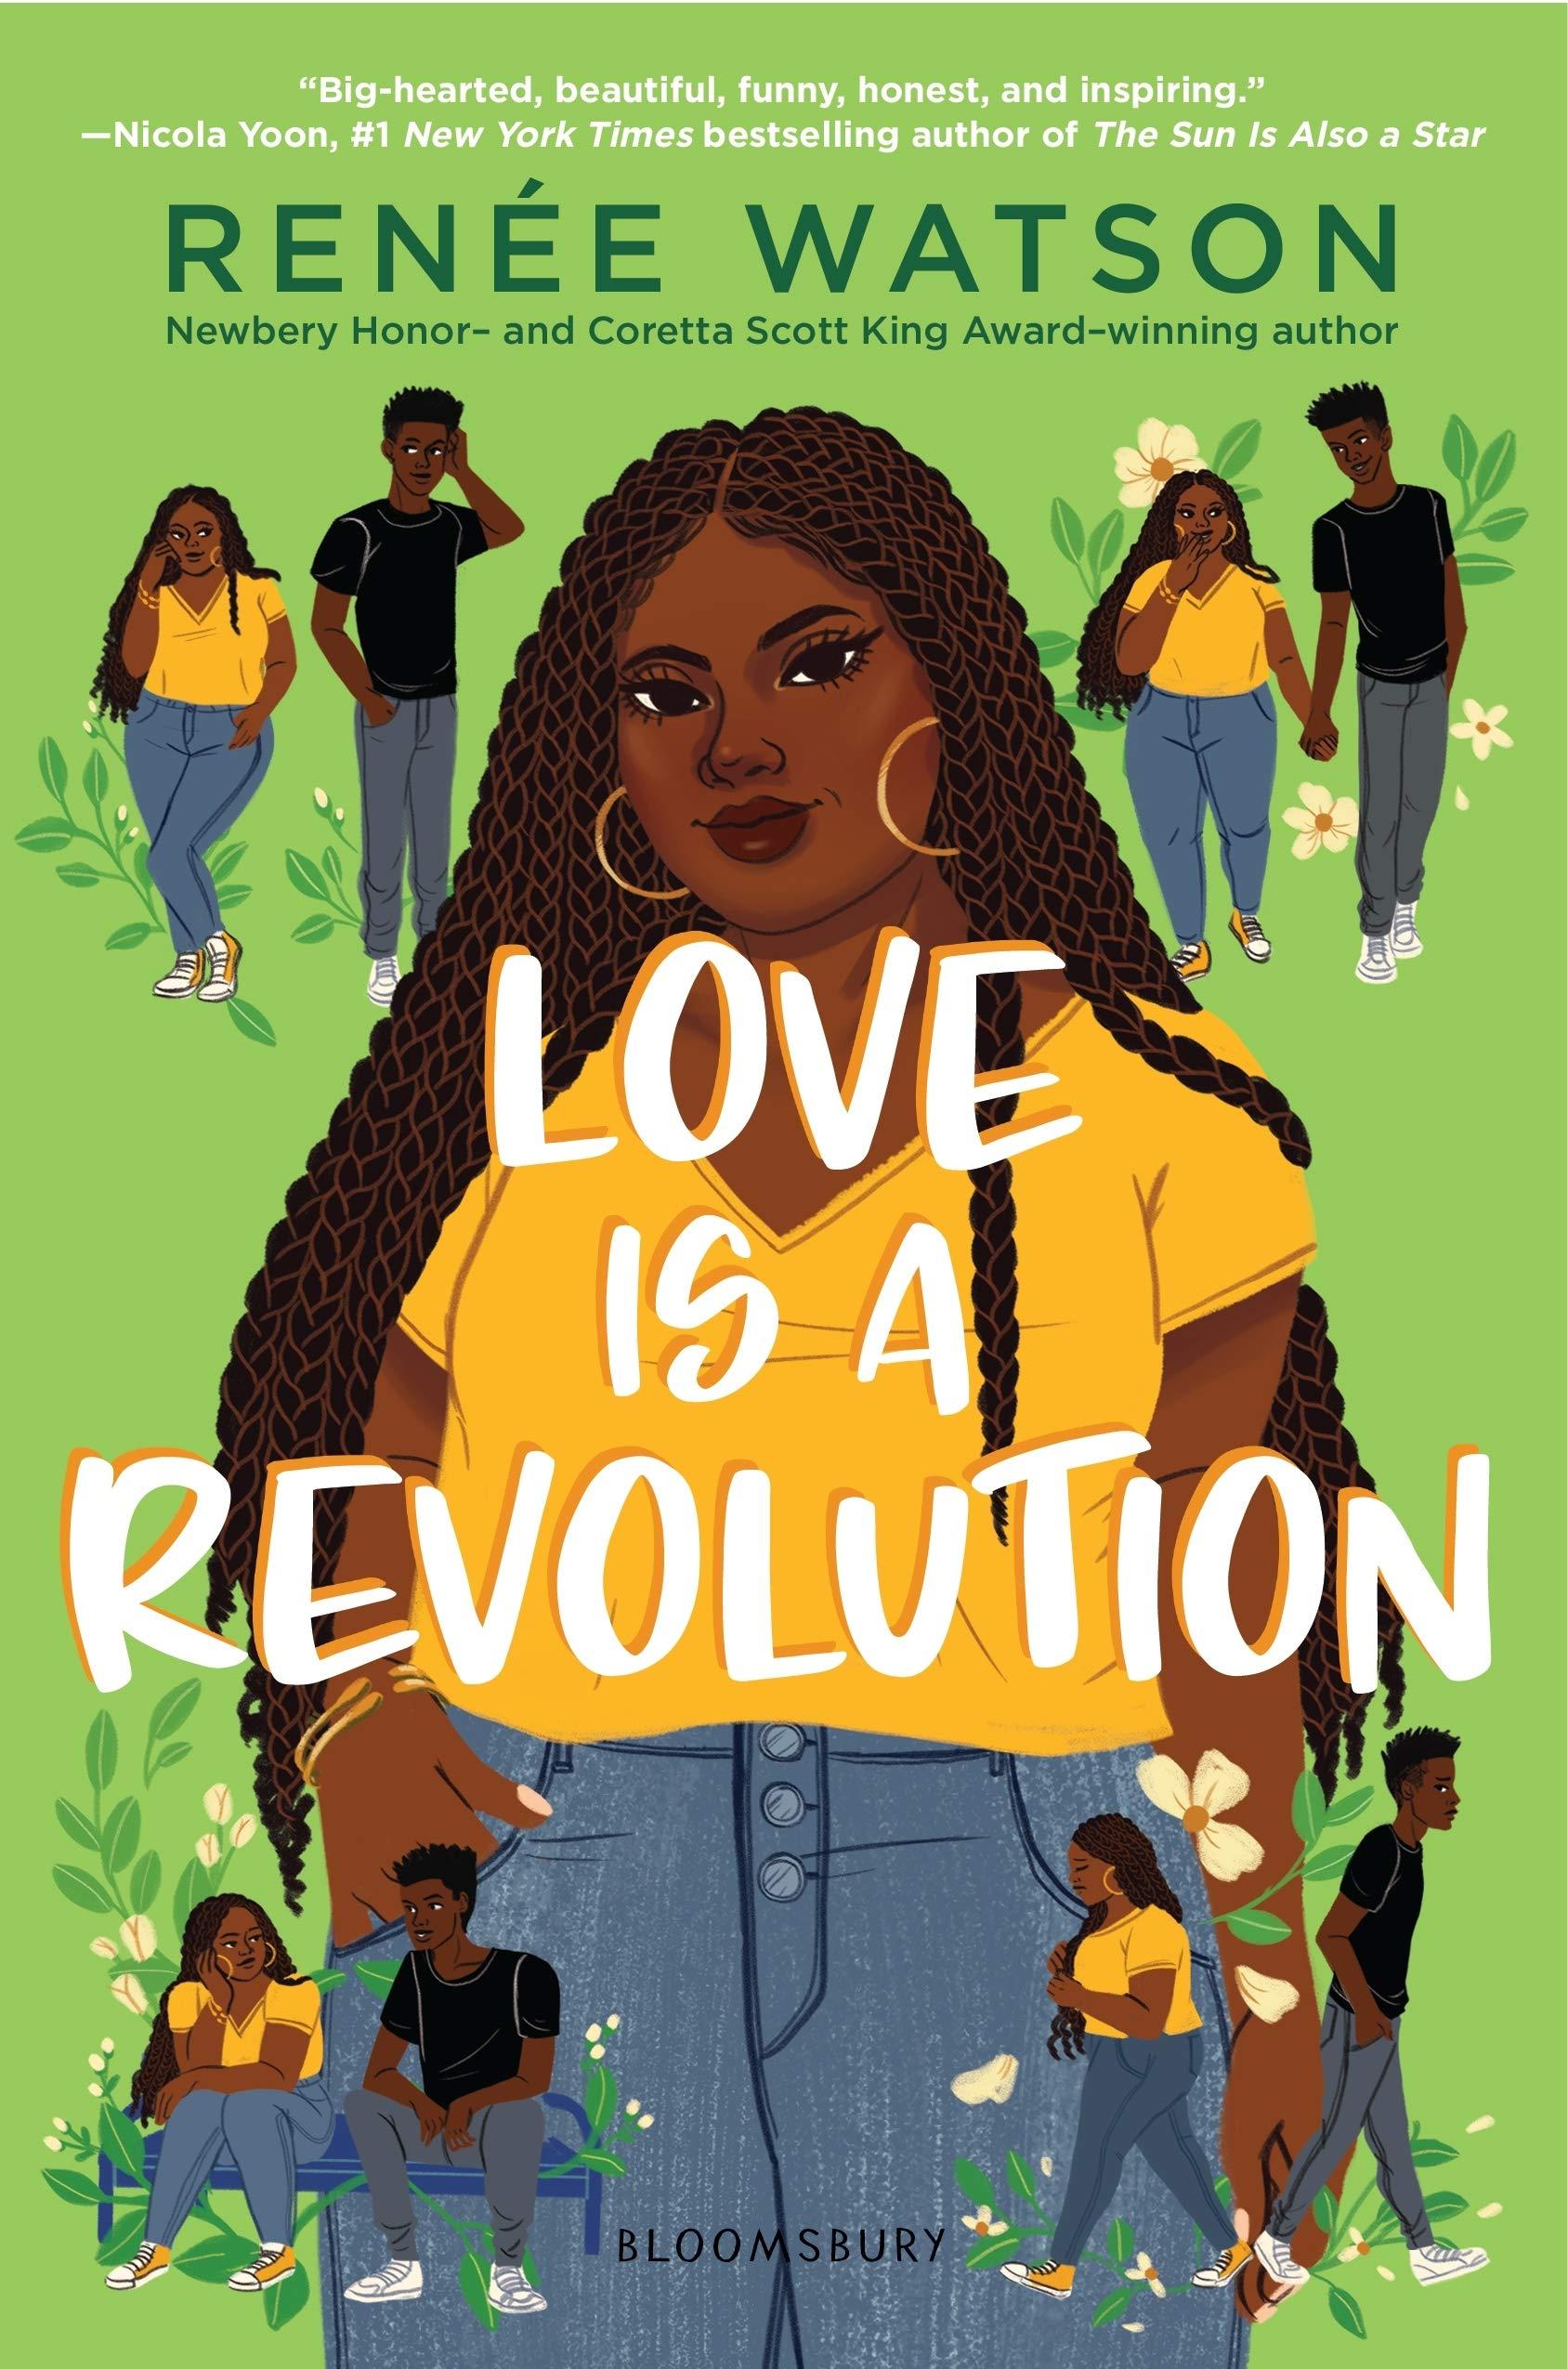 Amazon.com: Love Is a Revolution (9781547600601): Watson, Renée: Books